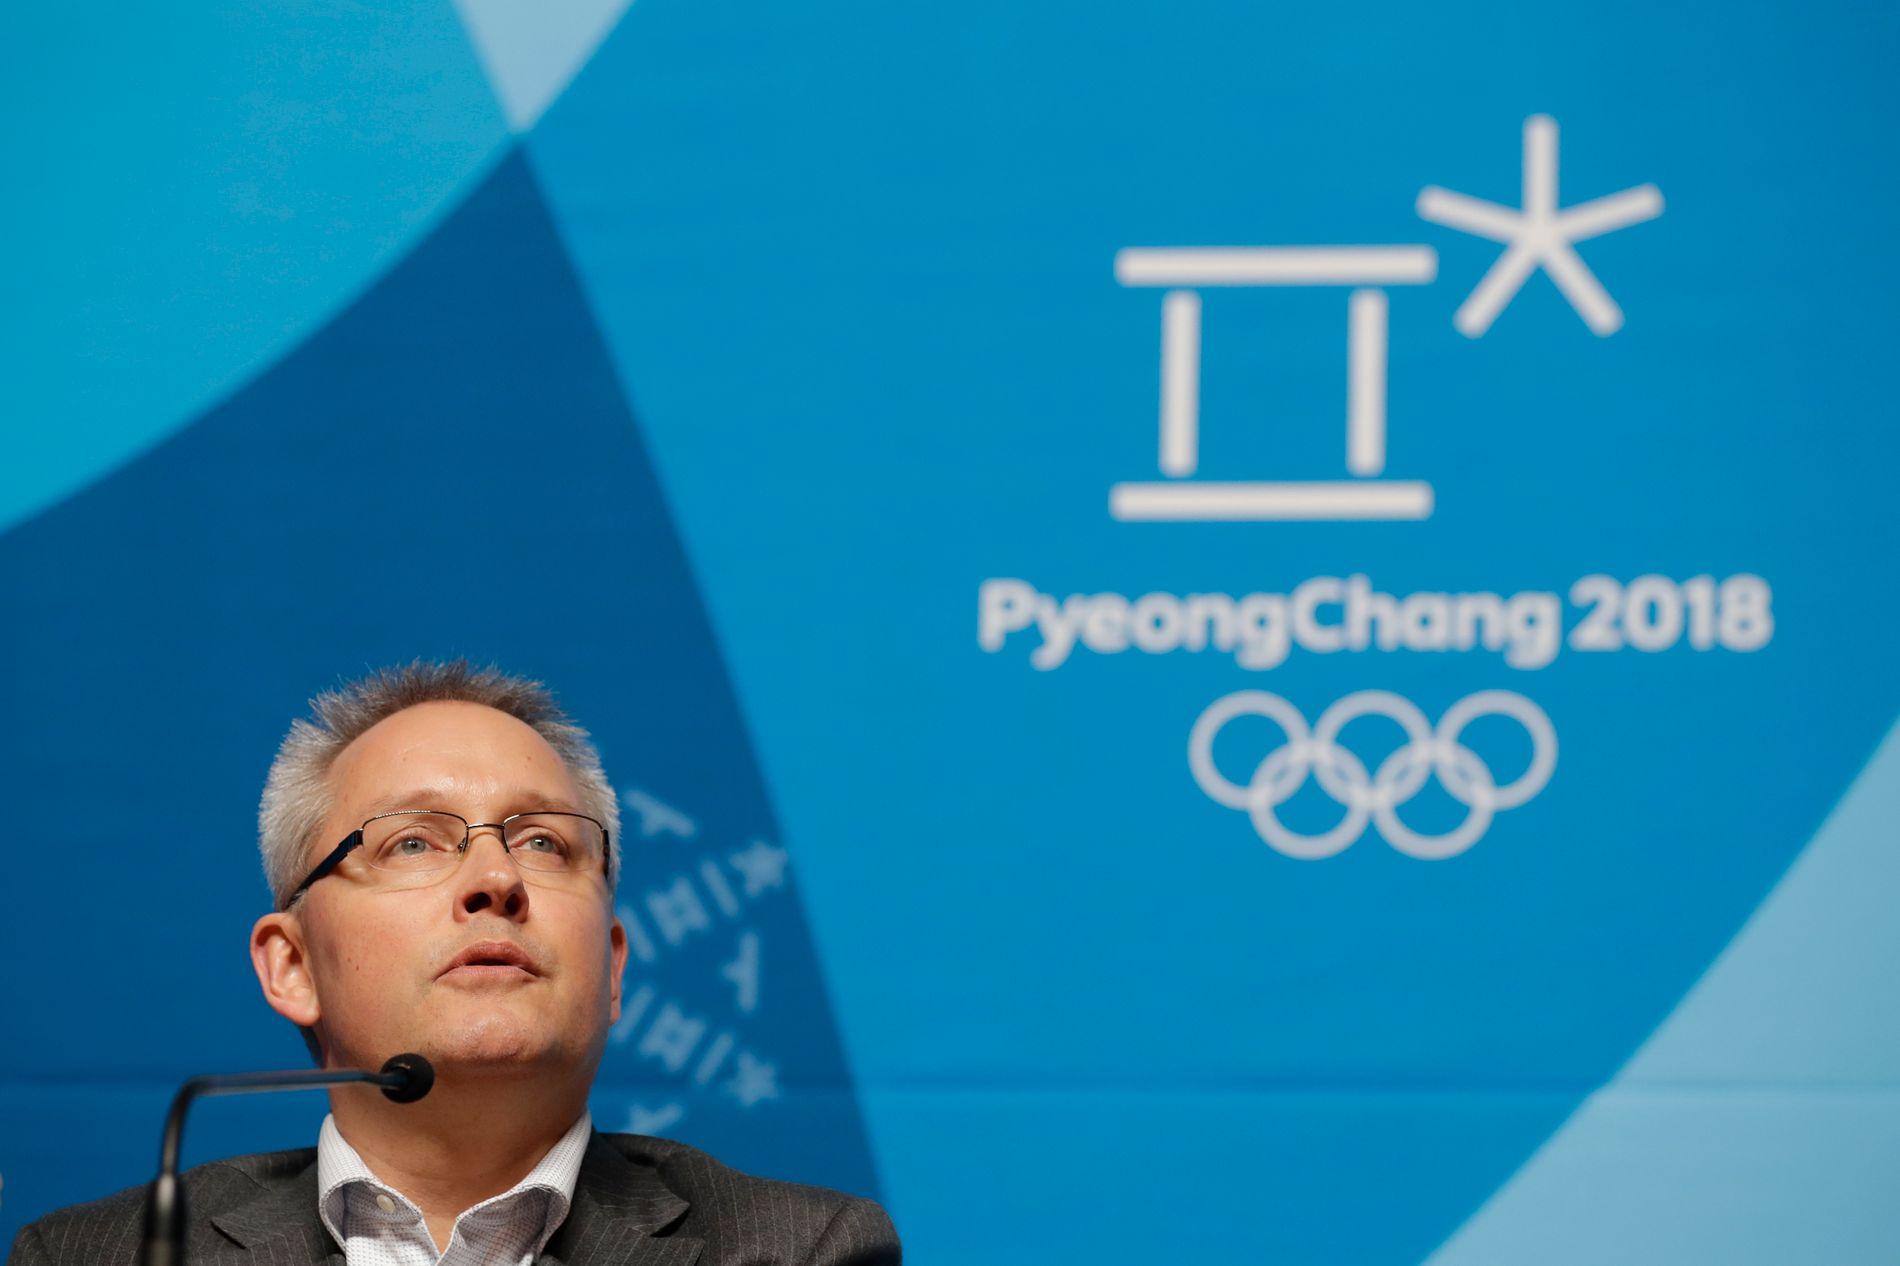 Generalsekretær Matthieu Reeb deltok nylig på en pressekonferanse om at russiske utøvere ber domstolen overprøve IOCs beslutning om å ikke invitere dem til OL.